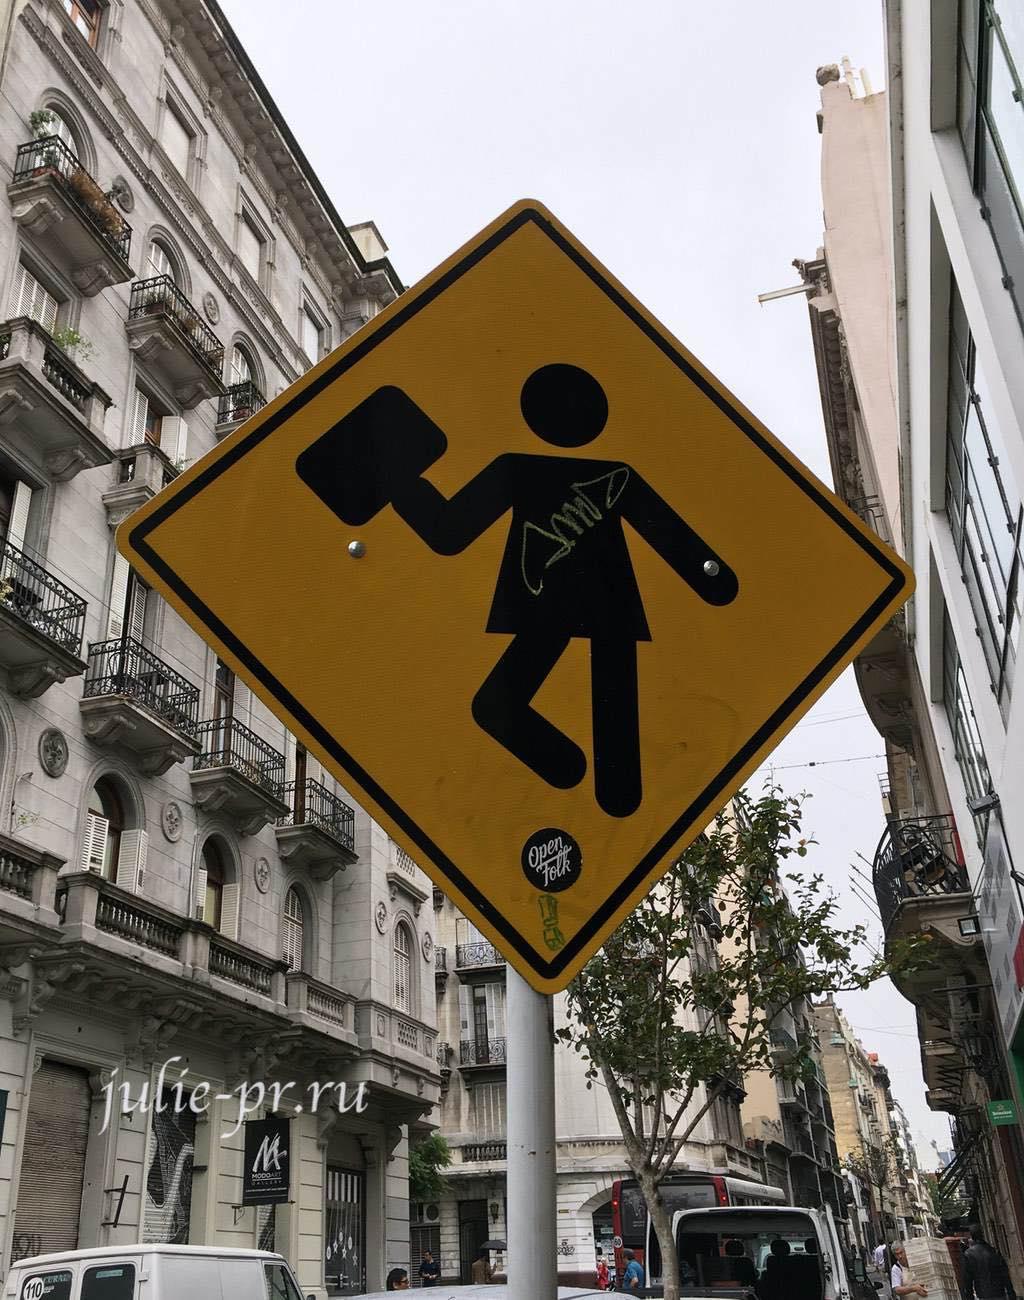 Аргентина, Буэнос-Айрес, Дорожный знак